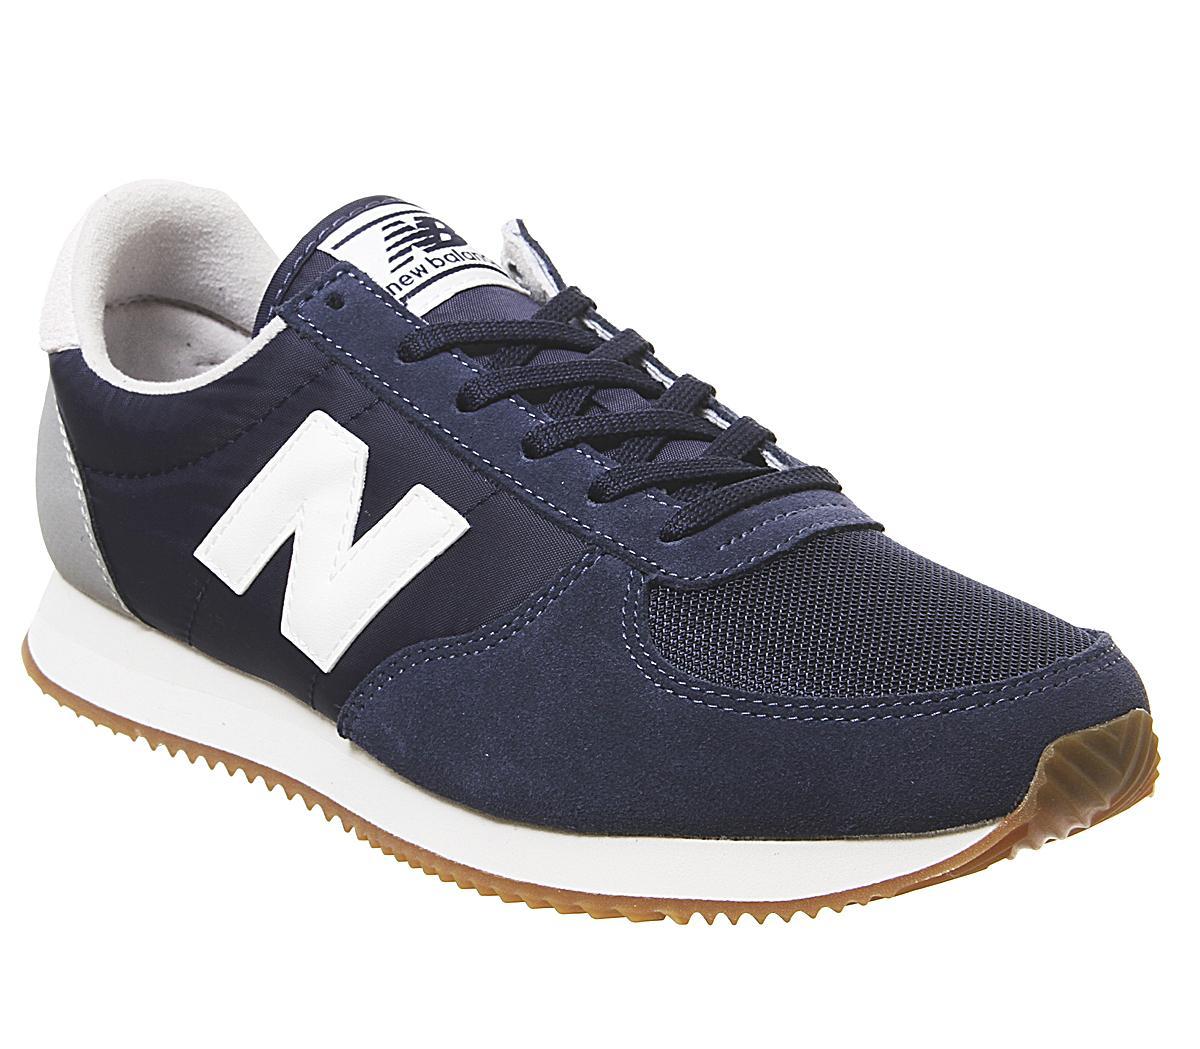 New Balance U220 Trainers Pigment White